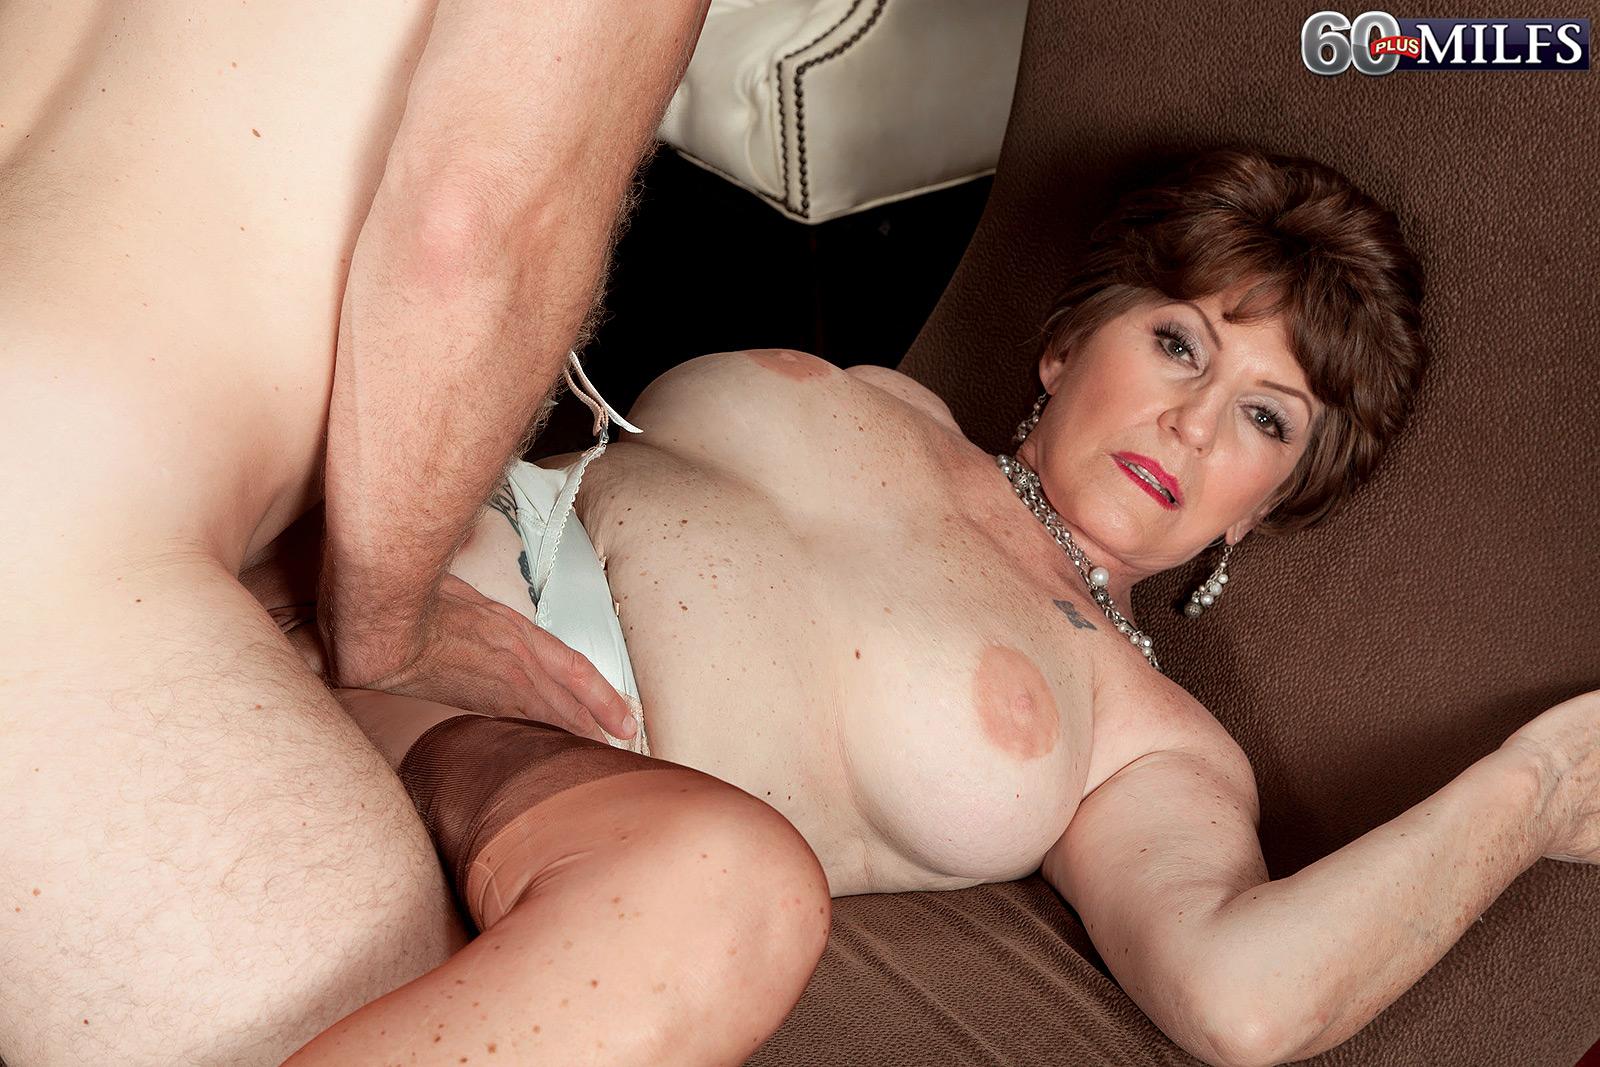 Anal Porno Mom beas anal therapy fuck mom pussy - xxxpicss